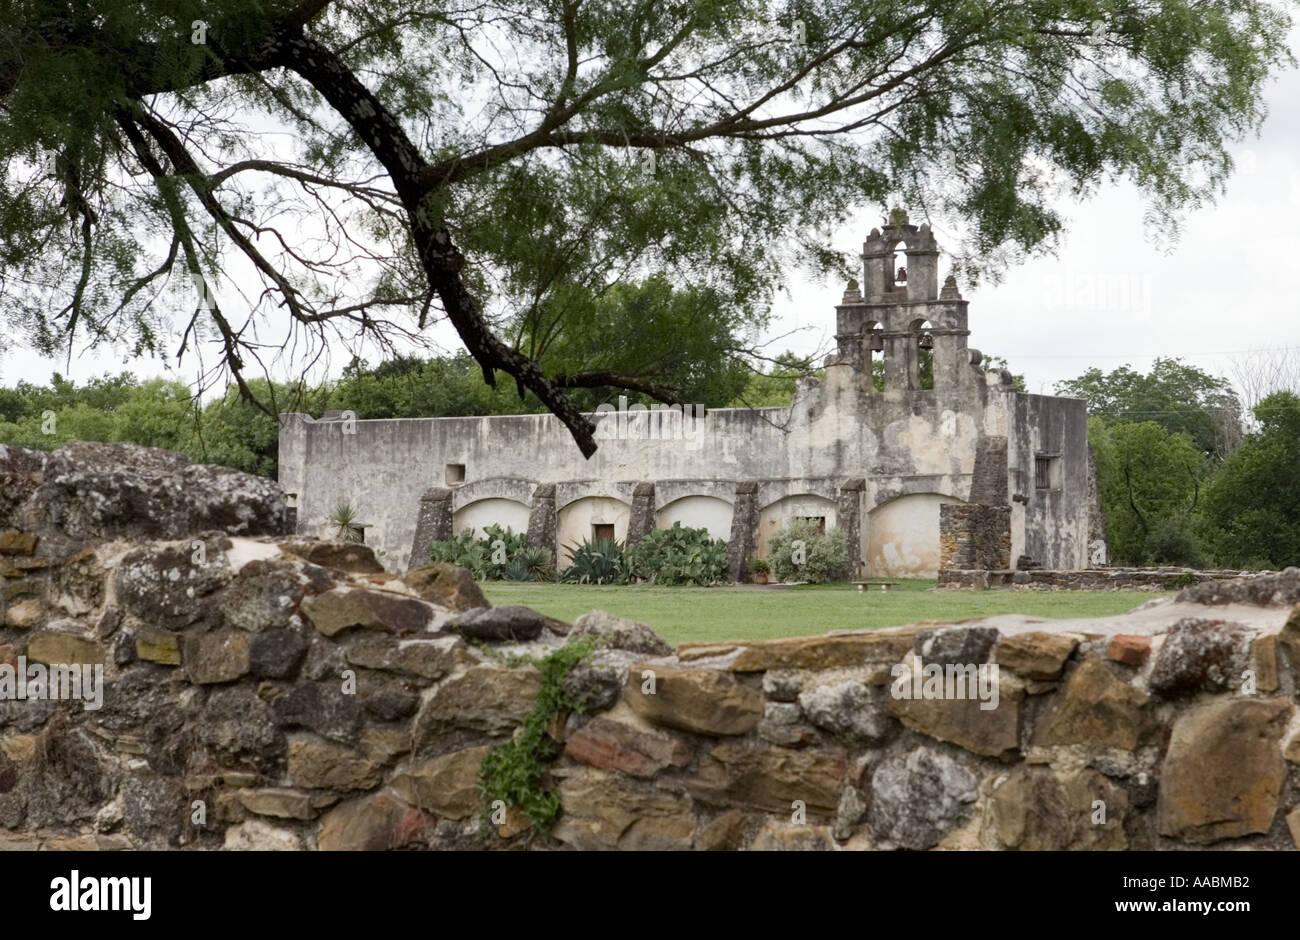 Mission san juan capistrano founded in 1731 near san antonio texas